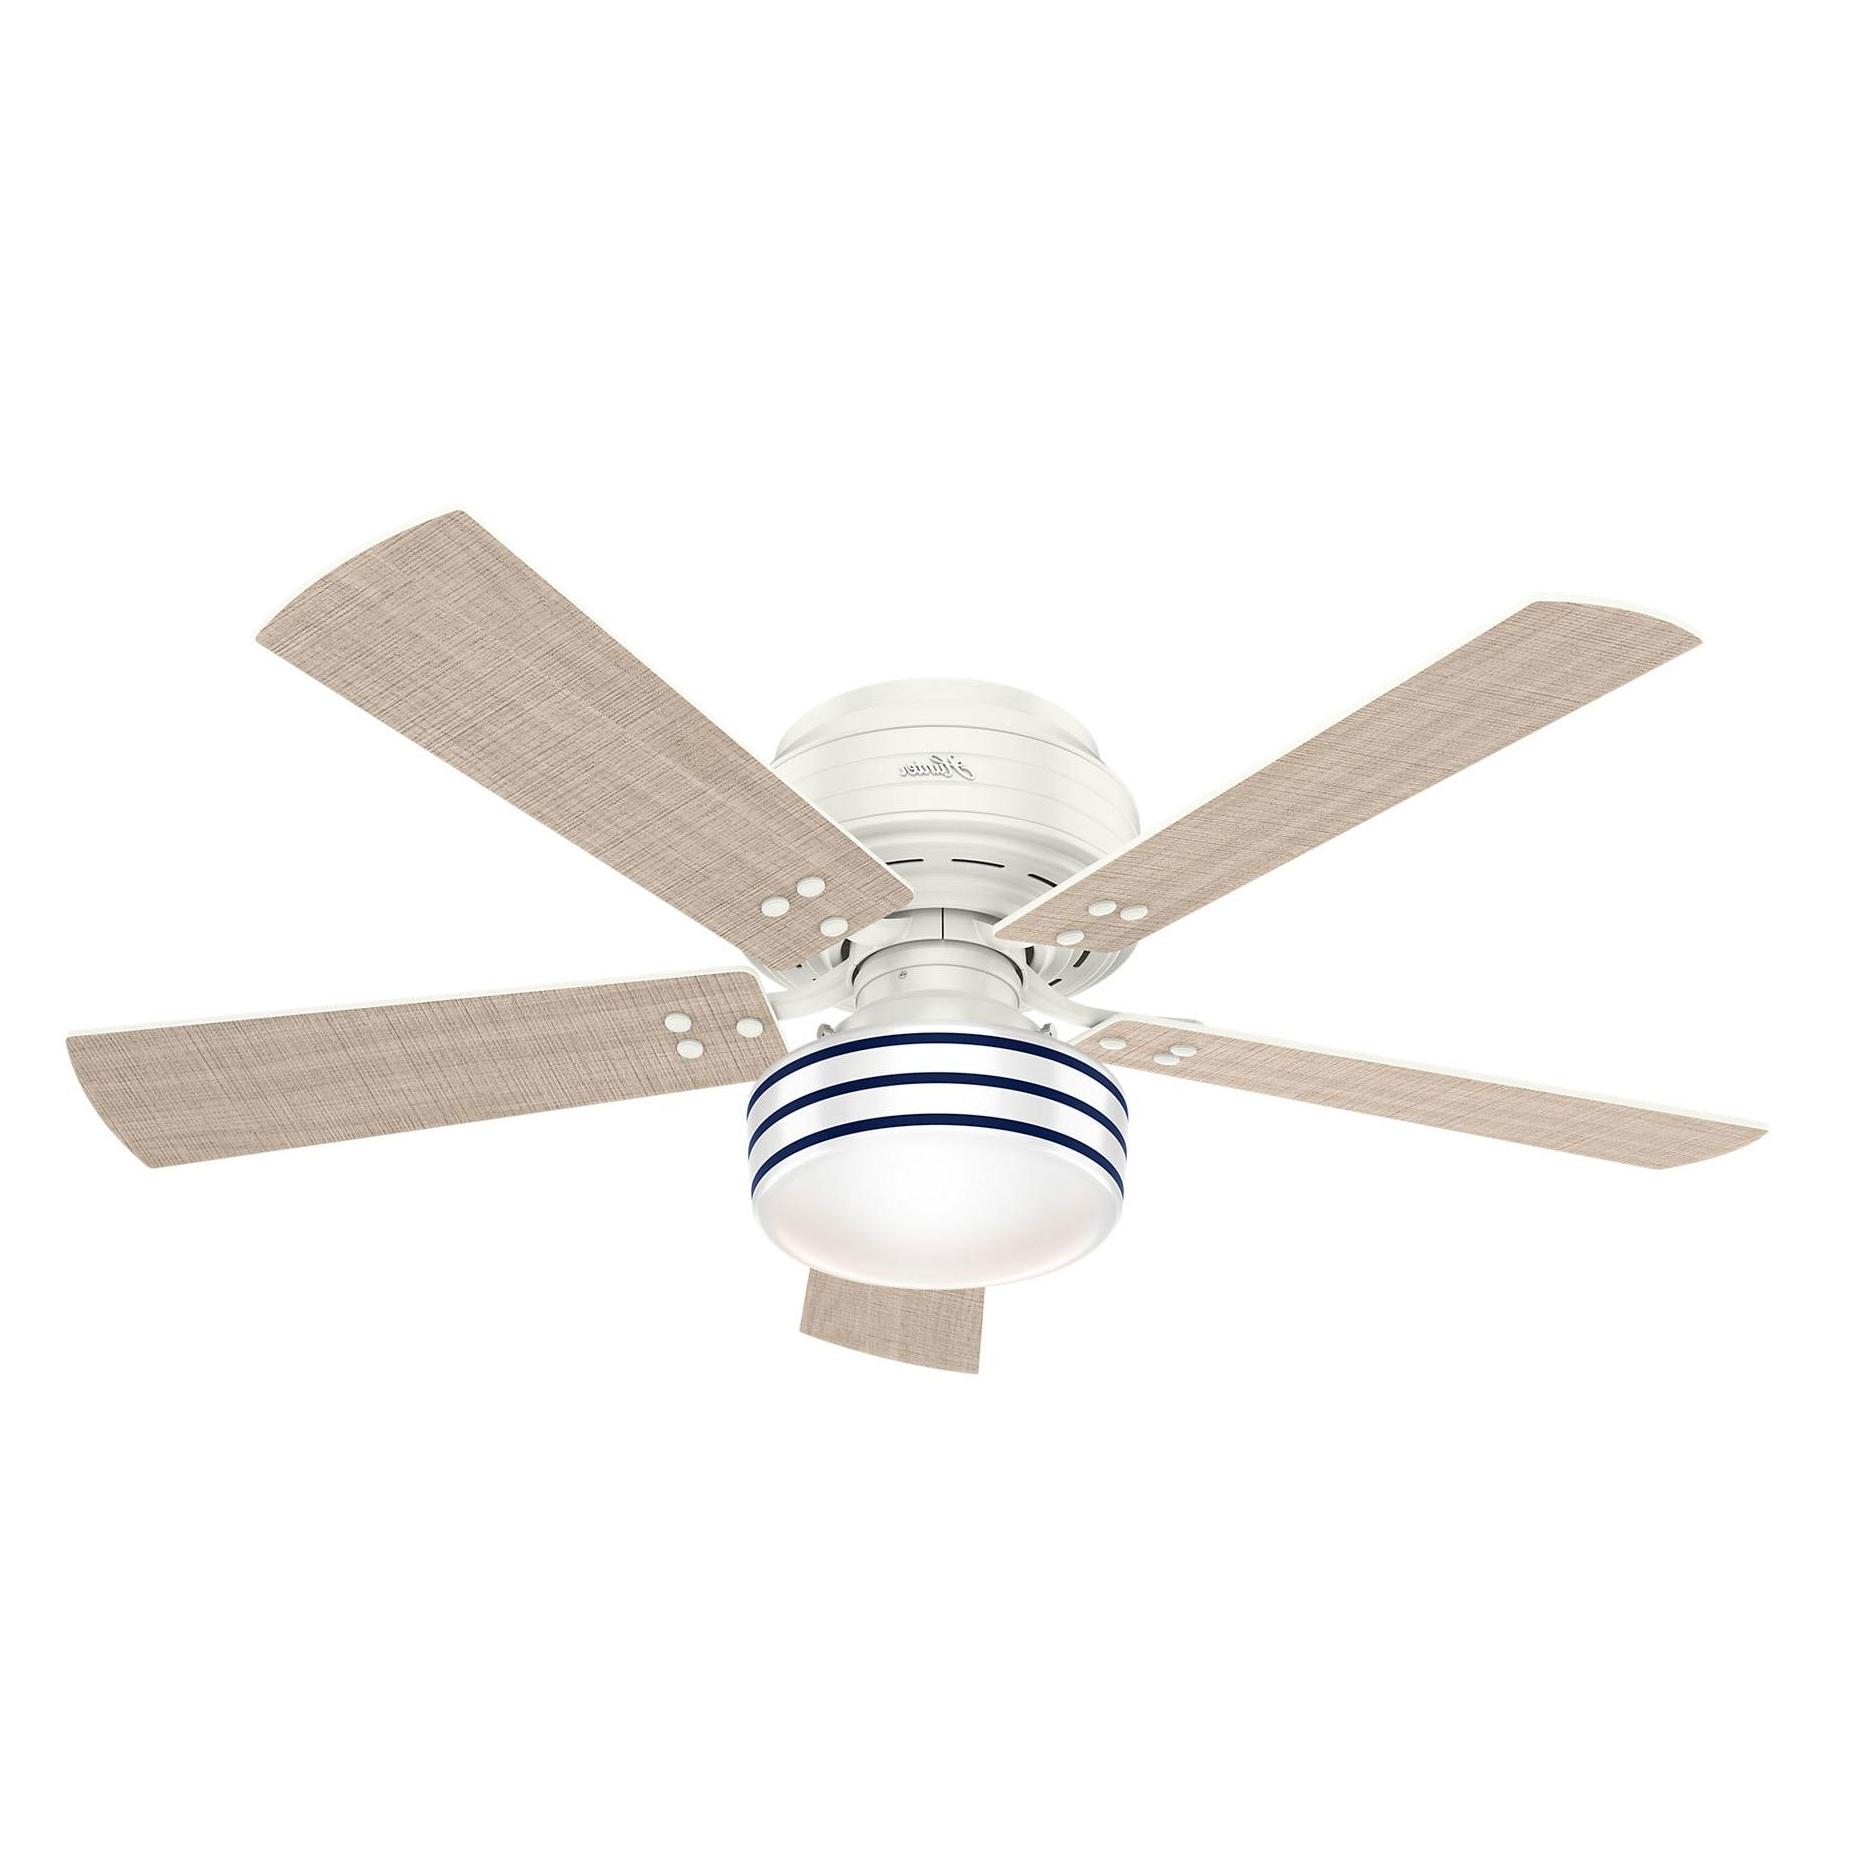 Cedar Key Low Profile Indoor/outdoor Ceiling Fan With Light Within Most Popular Hunter Indoor Outdoor Ceiling Fans With Lights (View 11 of 20)